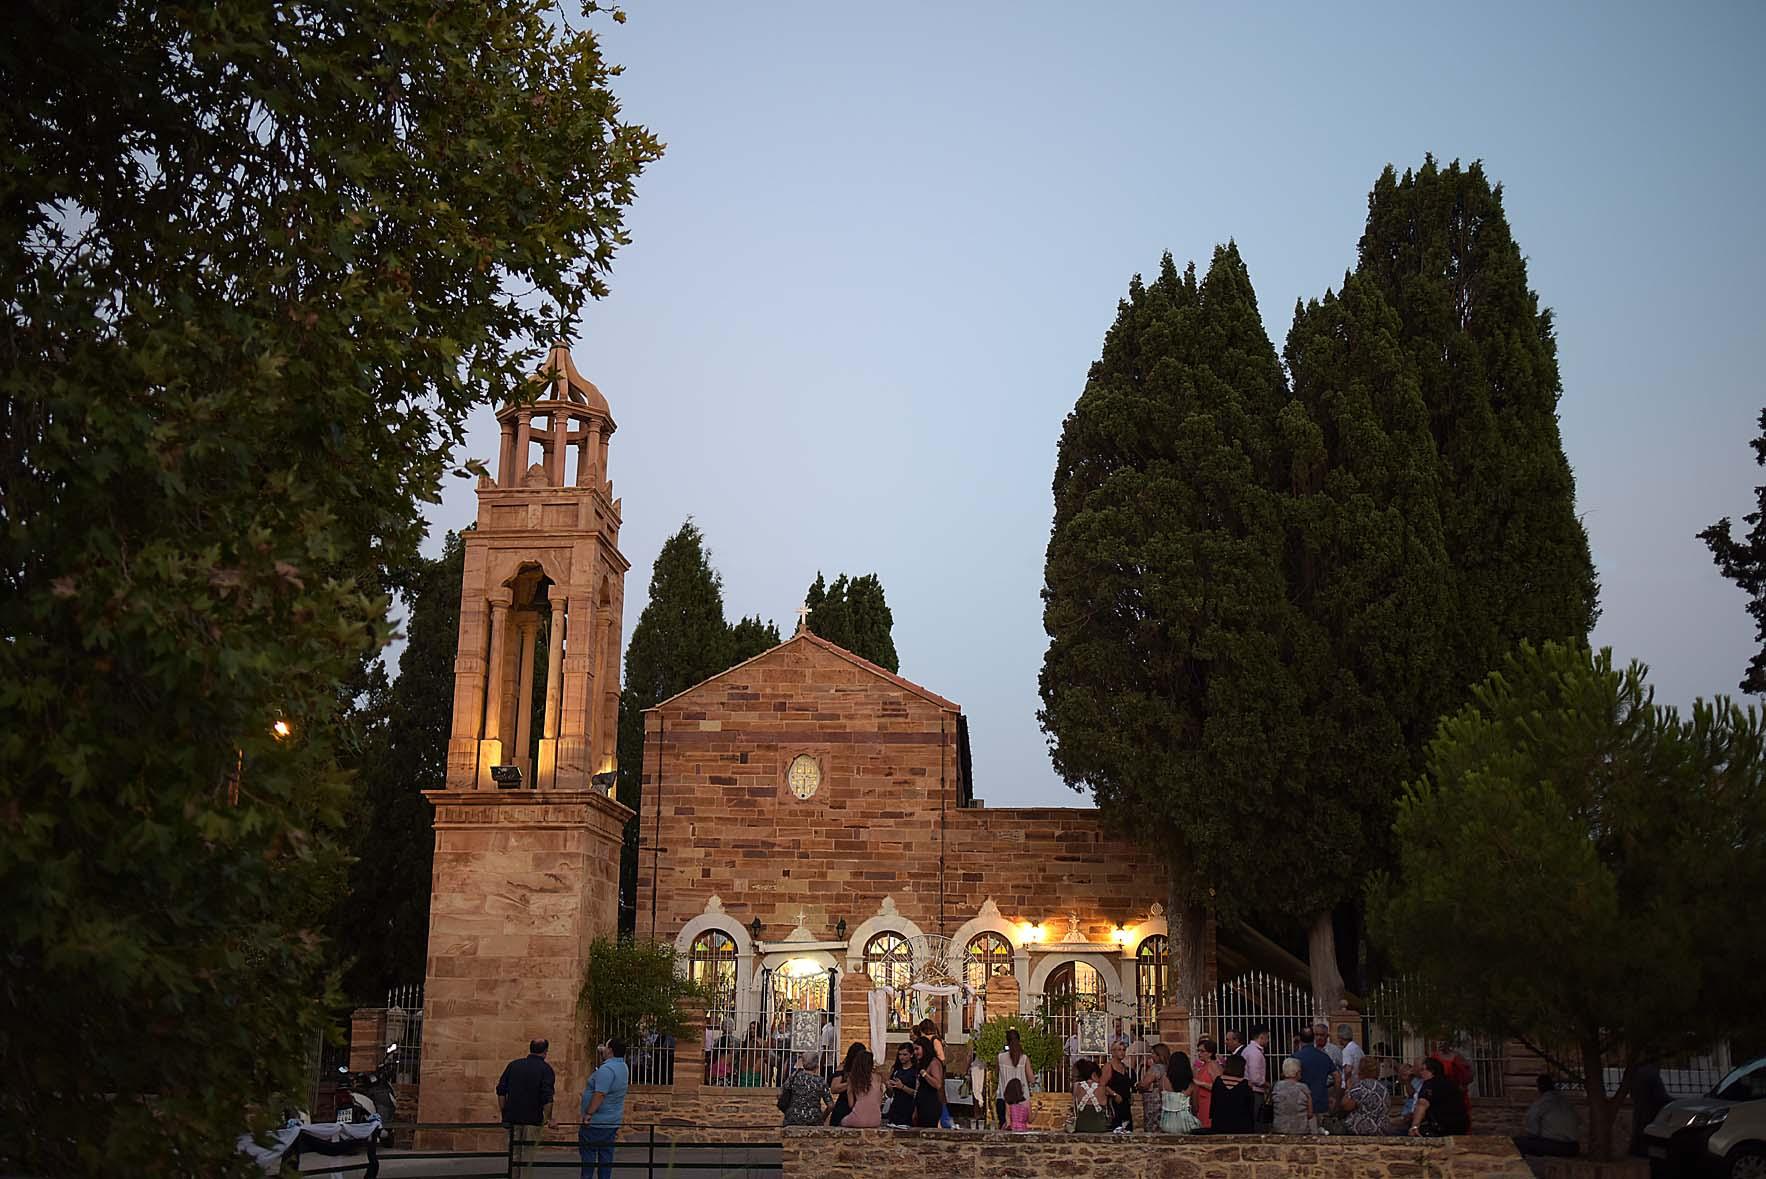 panagia-siriotissa-kampos-chios-christening-baptism-alexis-koumaditis-photography1